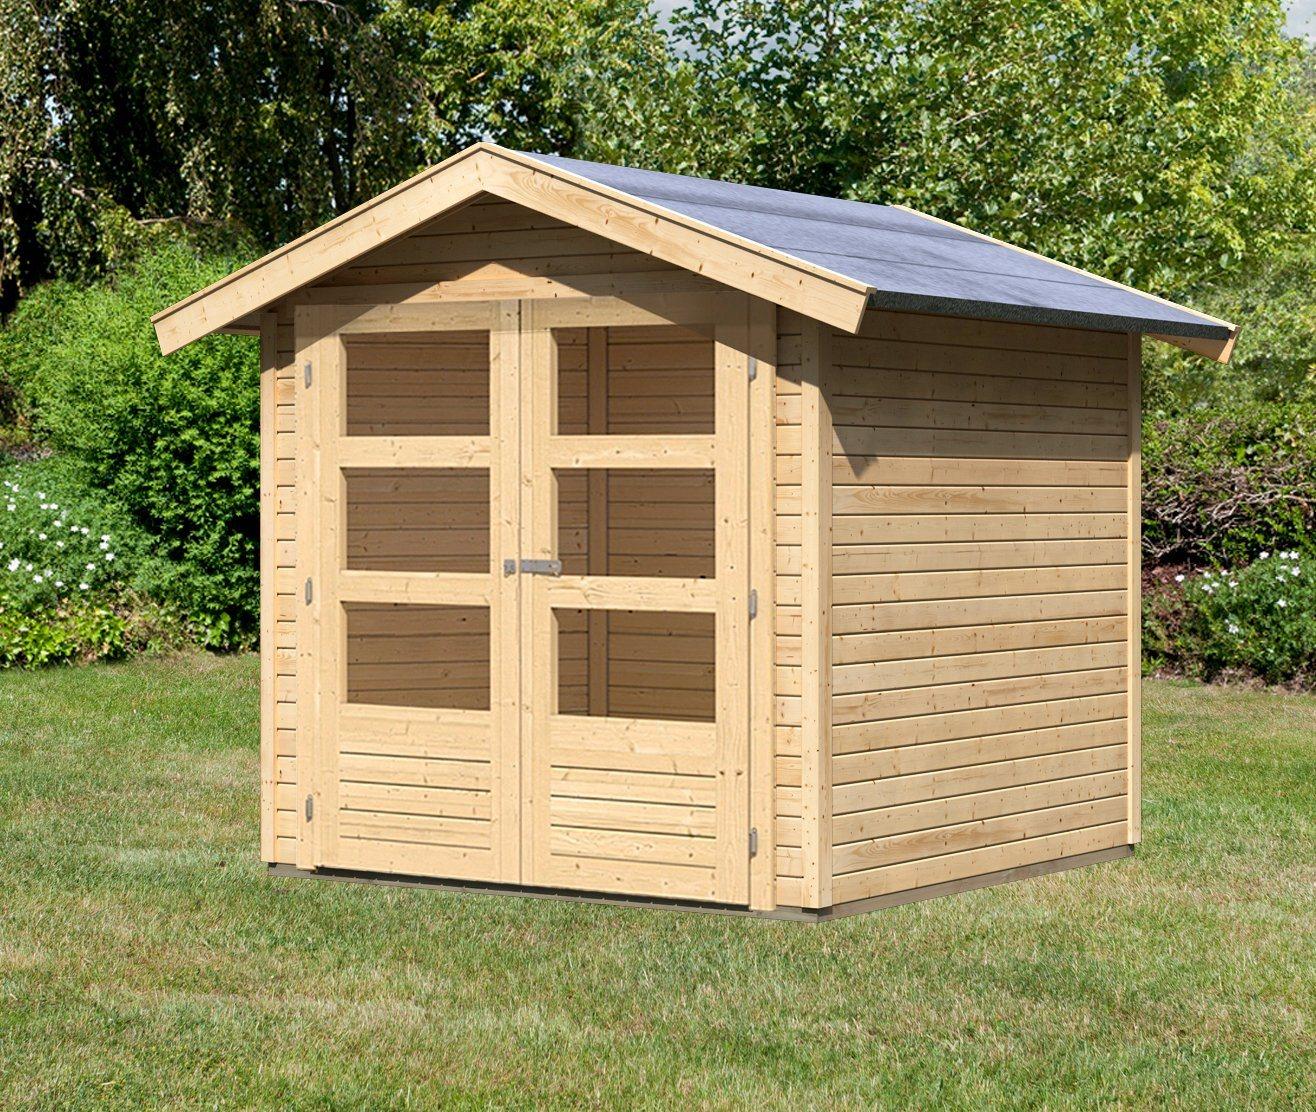 KARIBU Gartenhaus »Tostedt 3«, Gesamtmaß (BxT): 213x217 cm | Garten > Gartenhäuser | Karibu